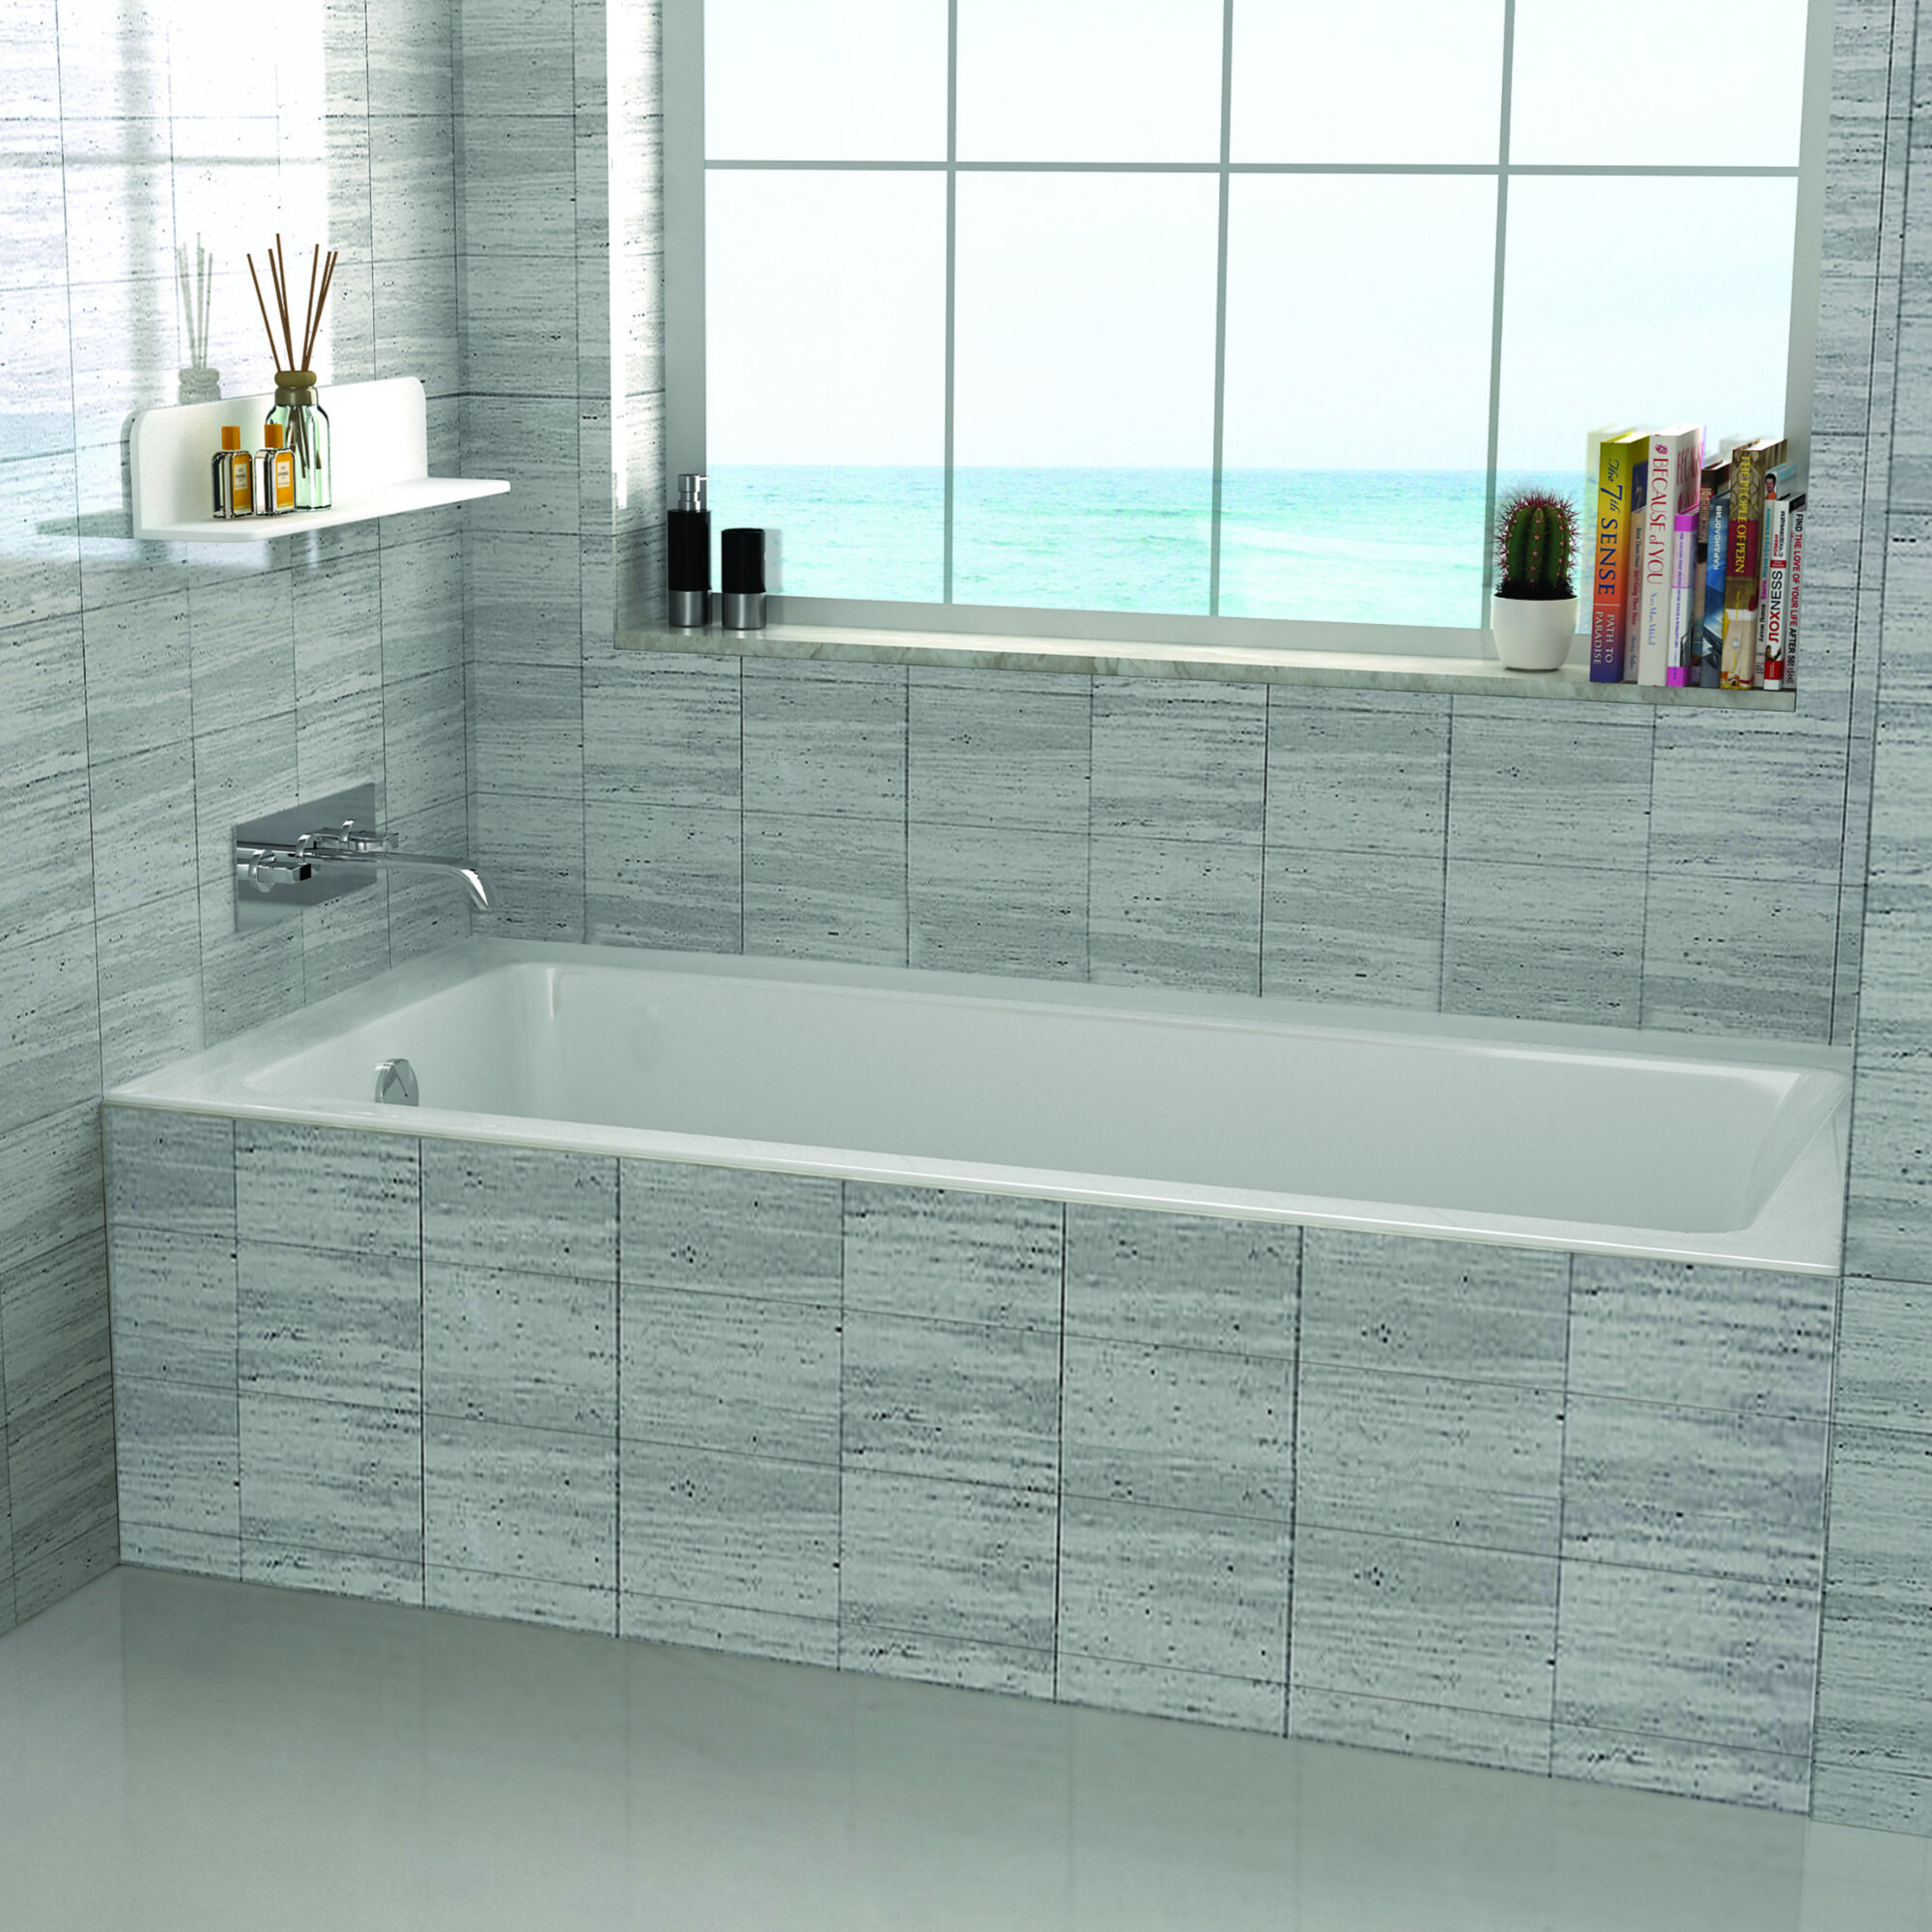 Wayfair Fine Fixtures 48 X 32 Drop In Soaking Bathtub